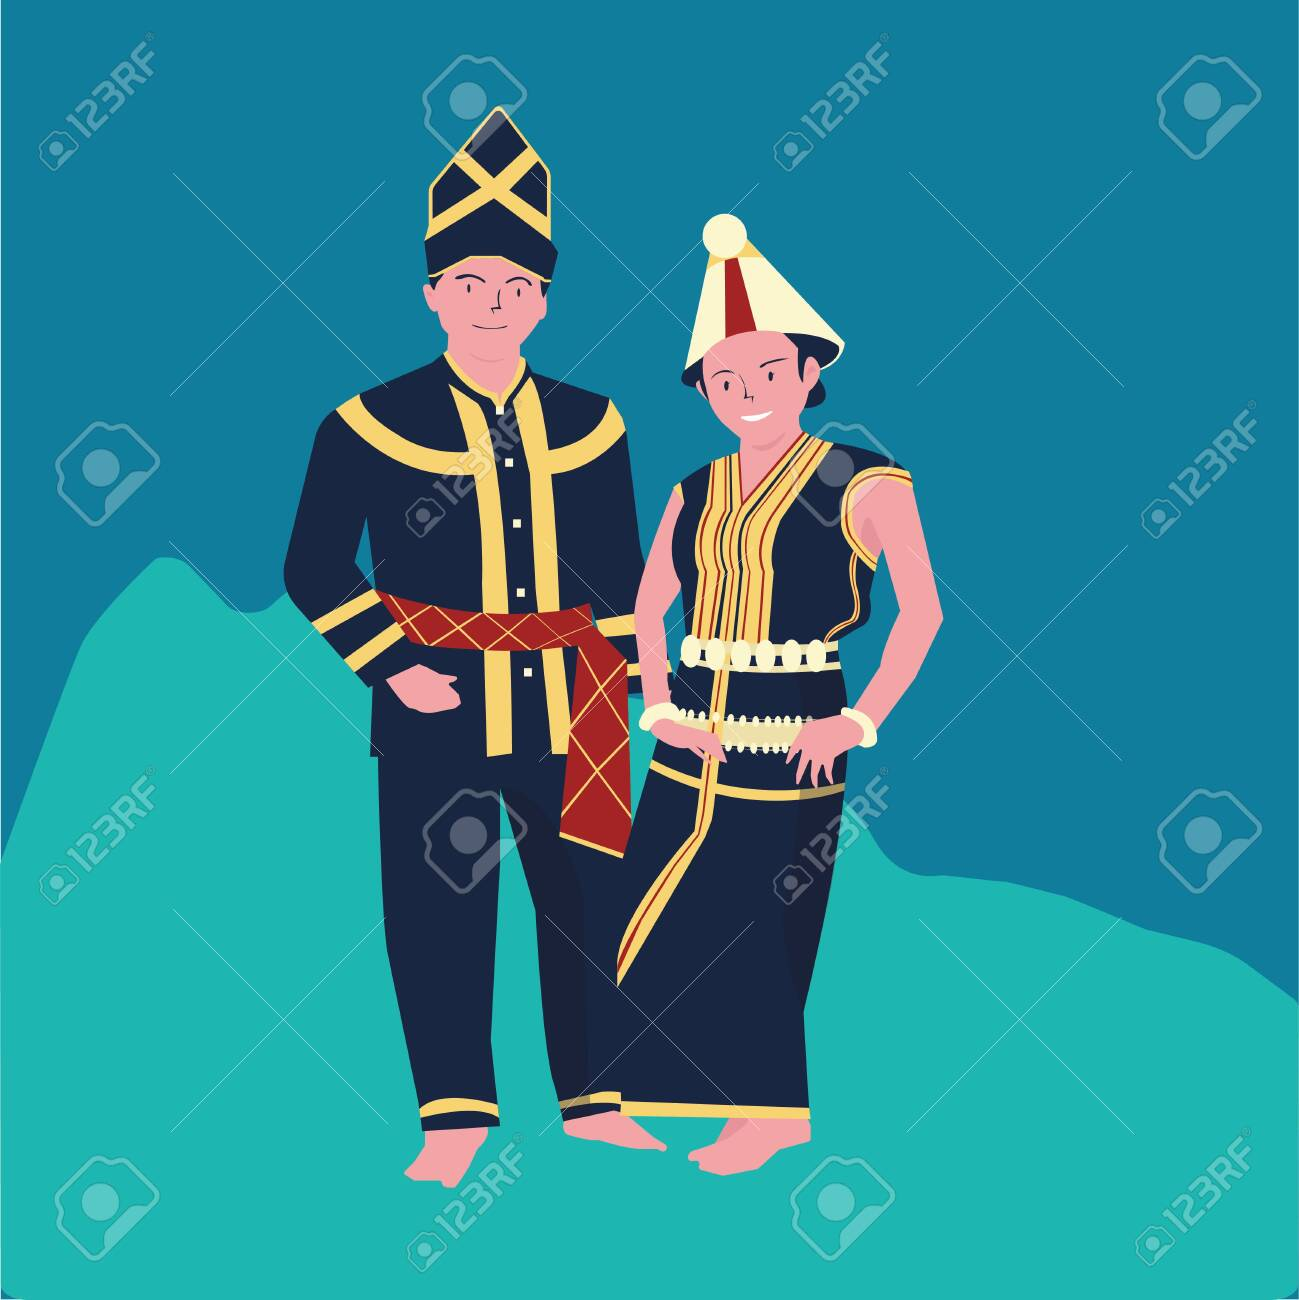 vector illustration of The KAAMATAN (hari kaamatan)festival:man and women KEDAZAN DUSUN dance (2) - 147949689